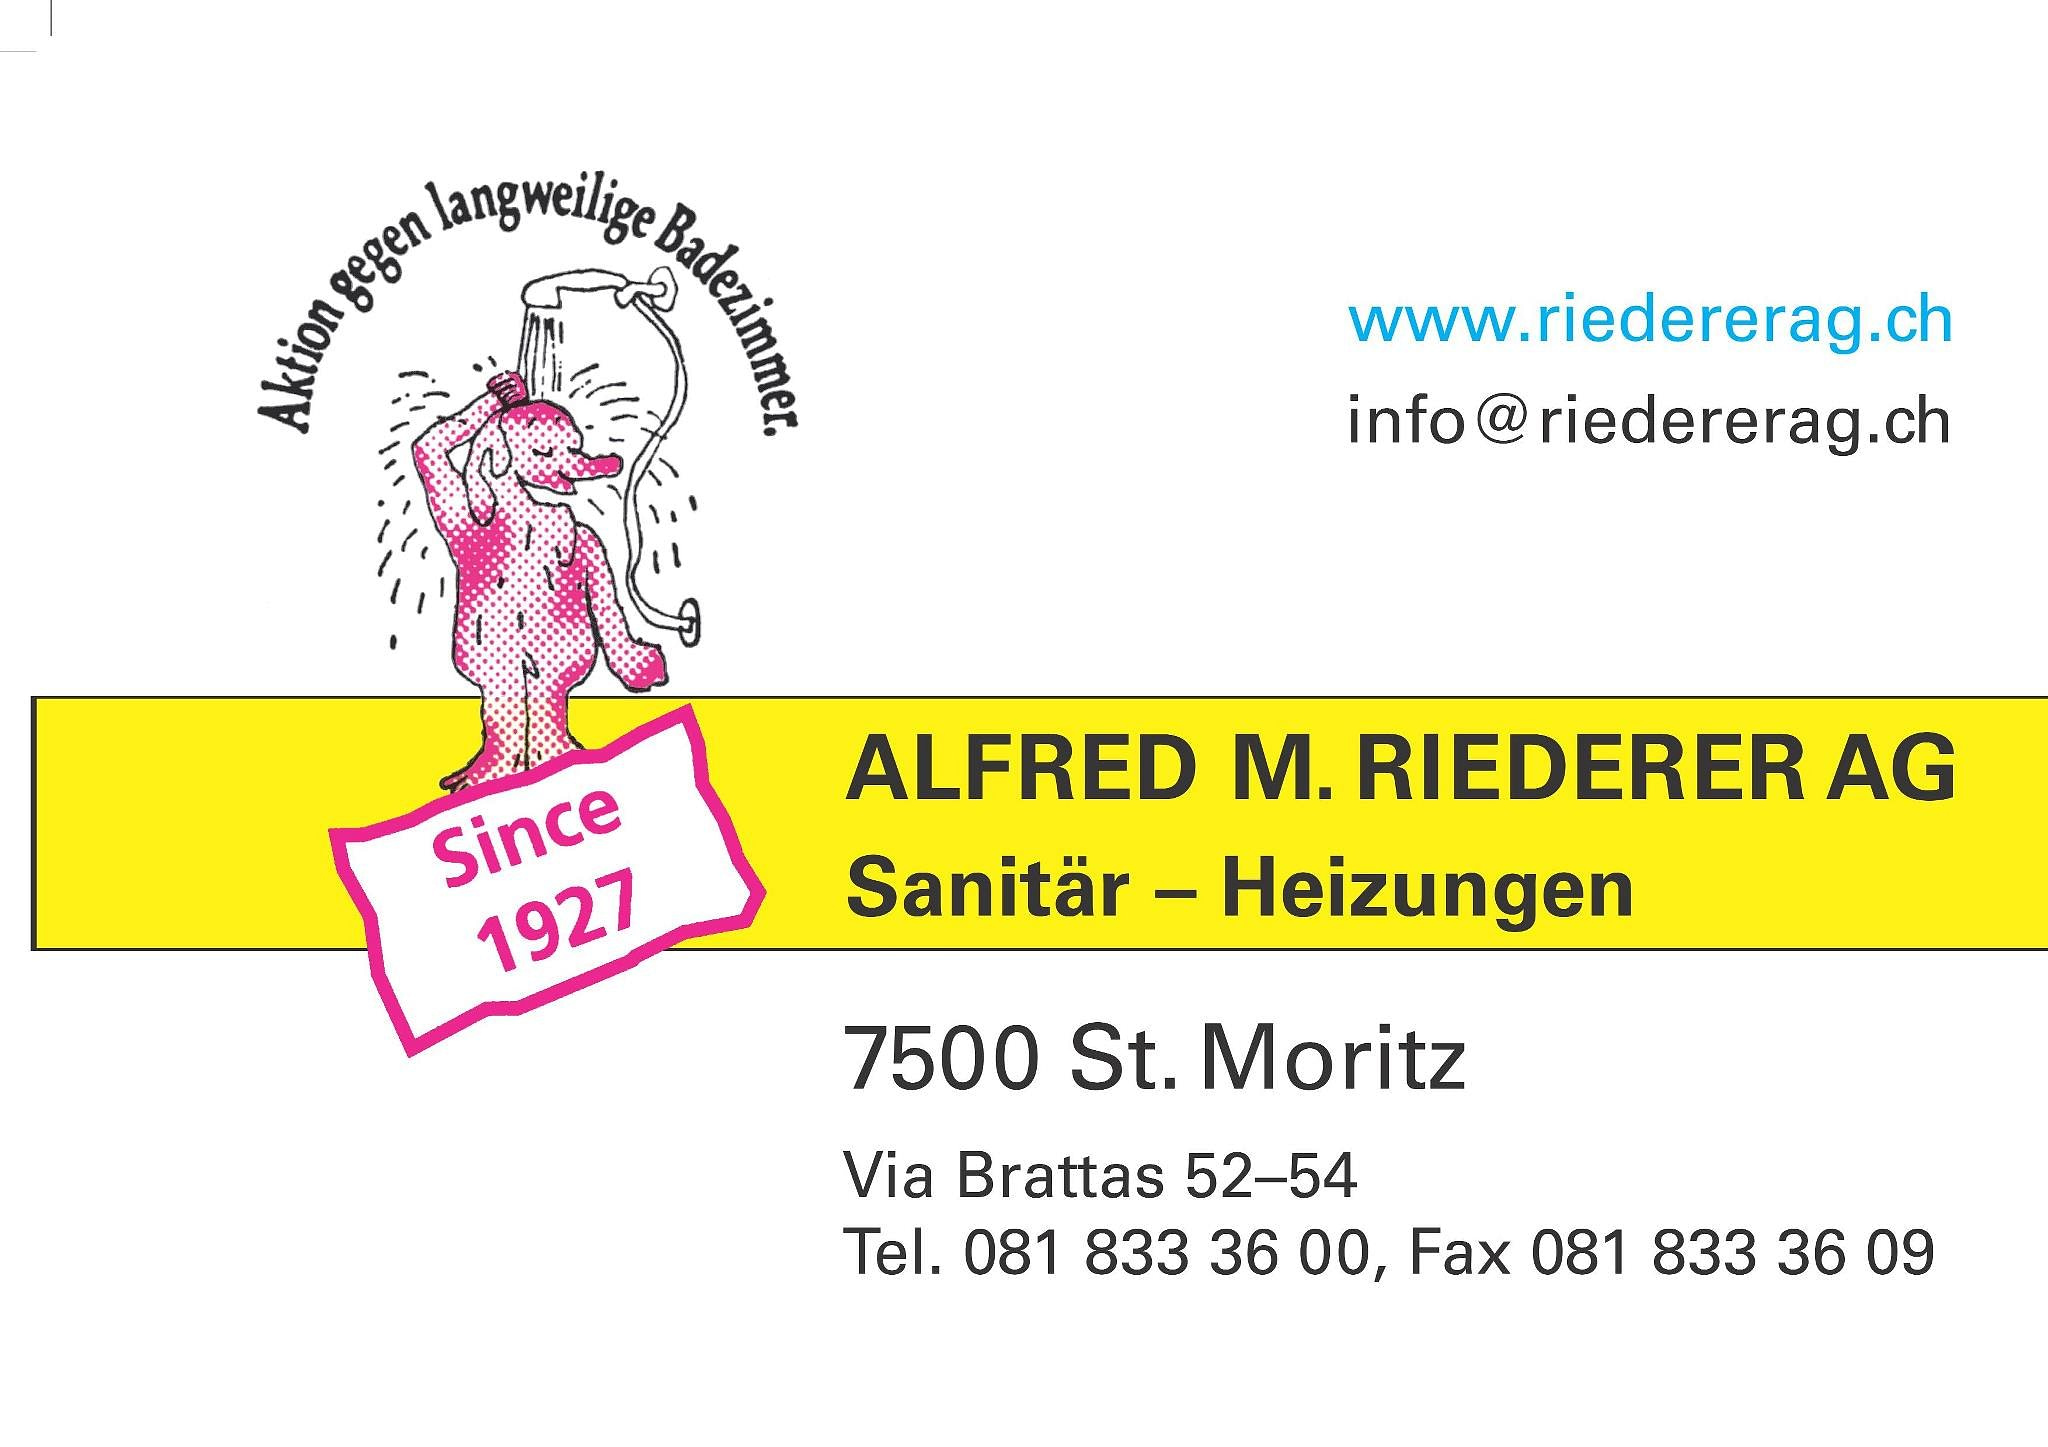 Alfred M. Riederer AG